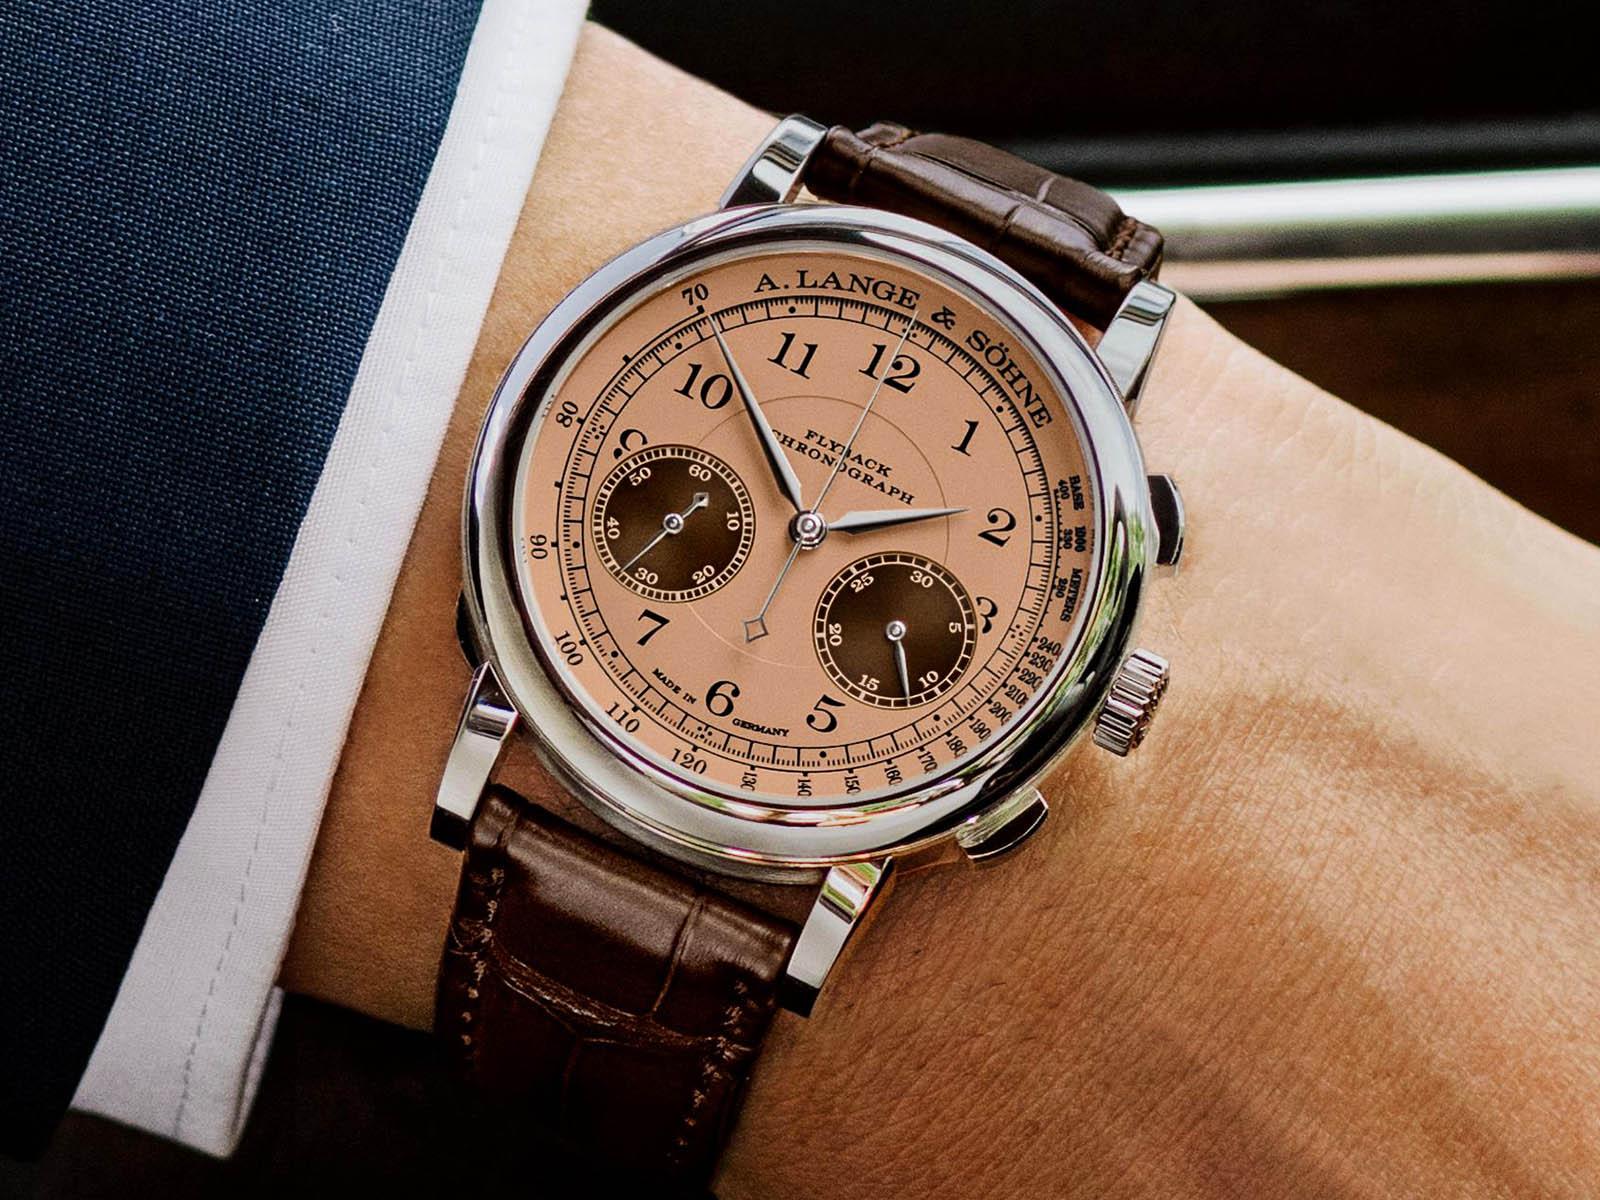 414-049-a-lange-sohne-1815-chronograph-2021-concorso-edition-5.jpg